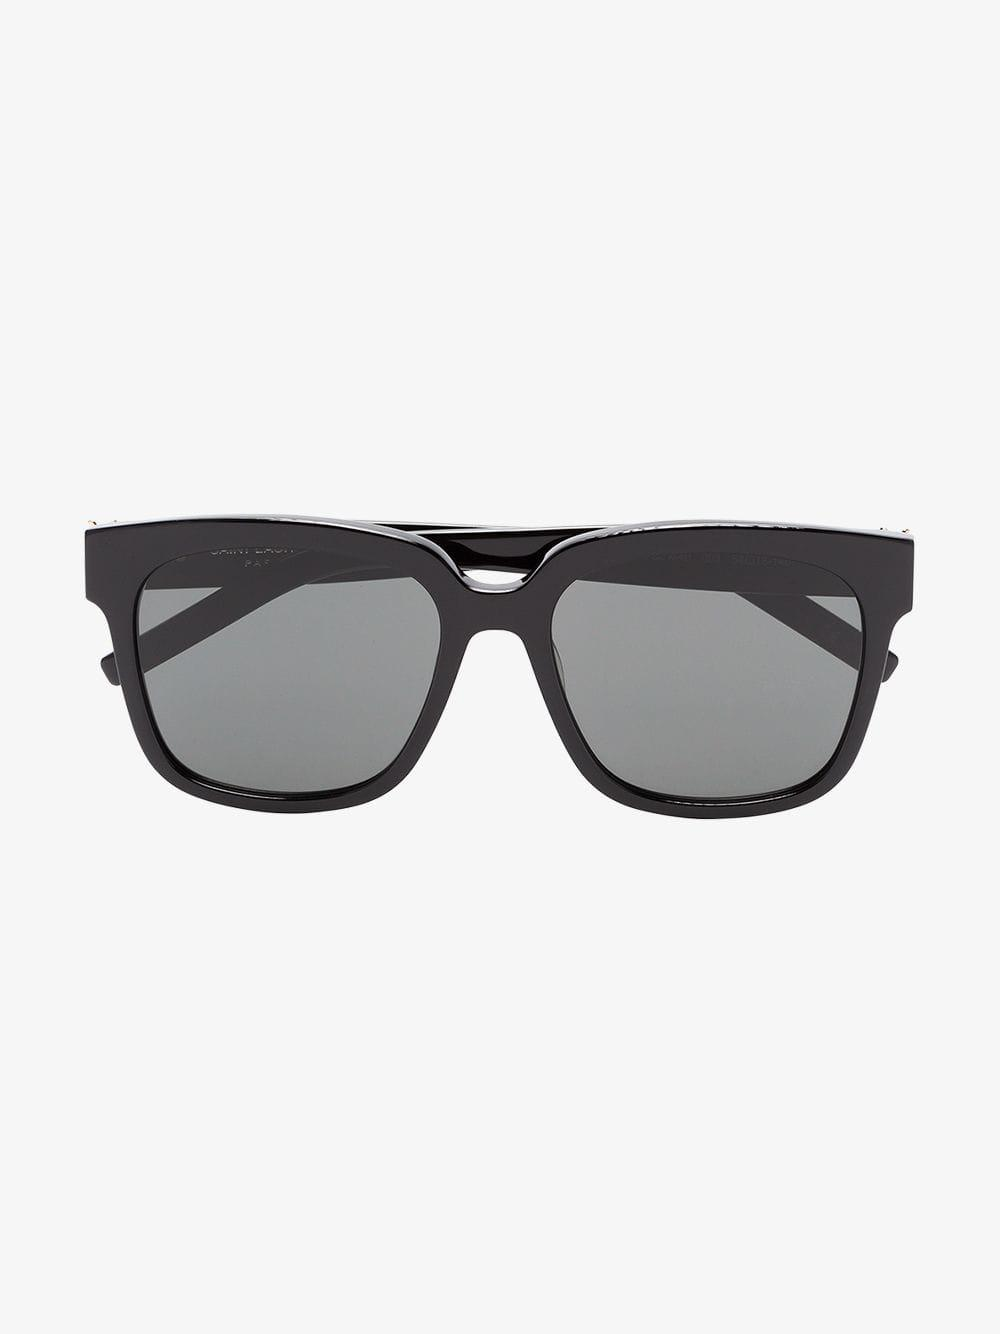 9d23136e537 Saint Laurent - Black M40 003 Square Sunglasses for Men - Lyst. View  fullscreen